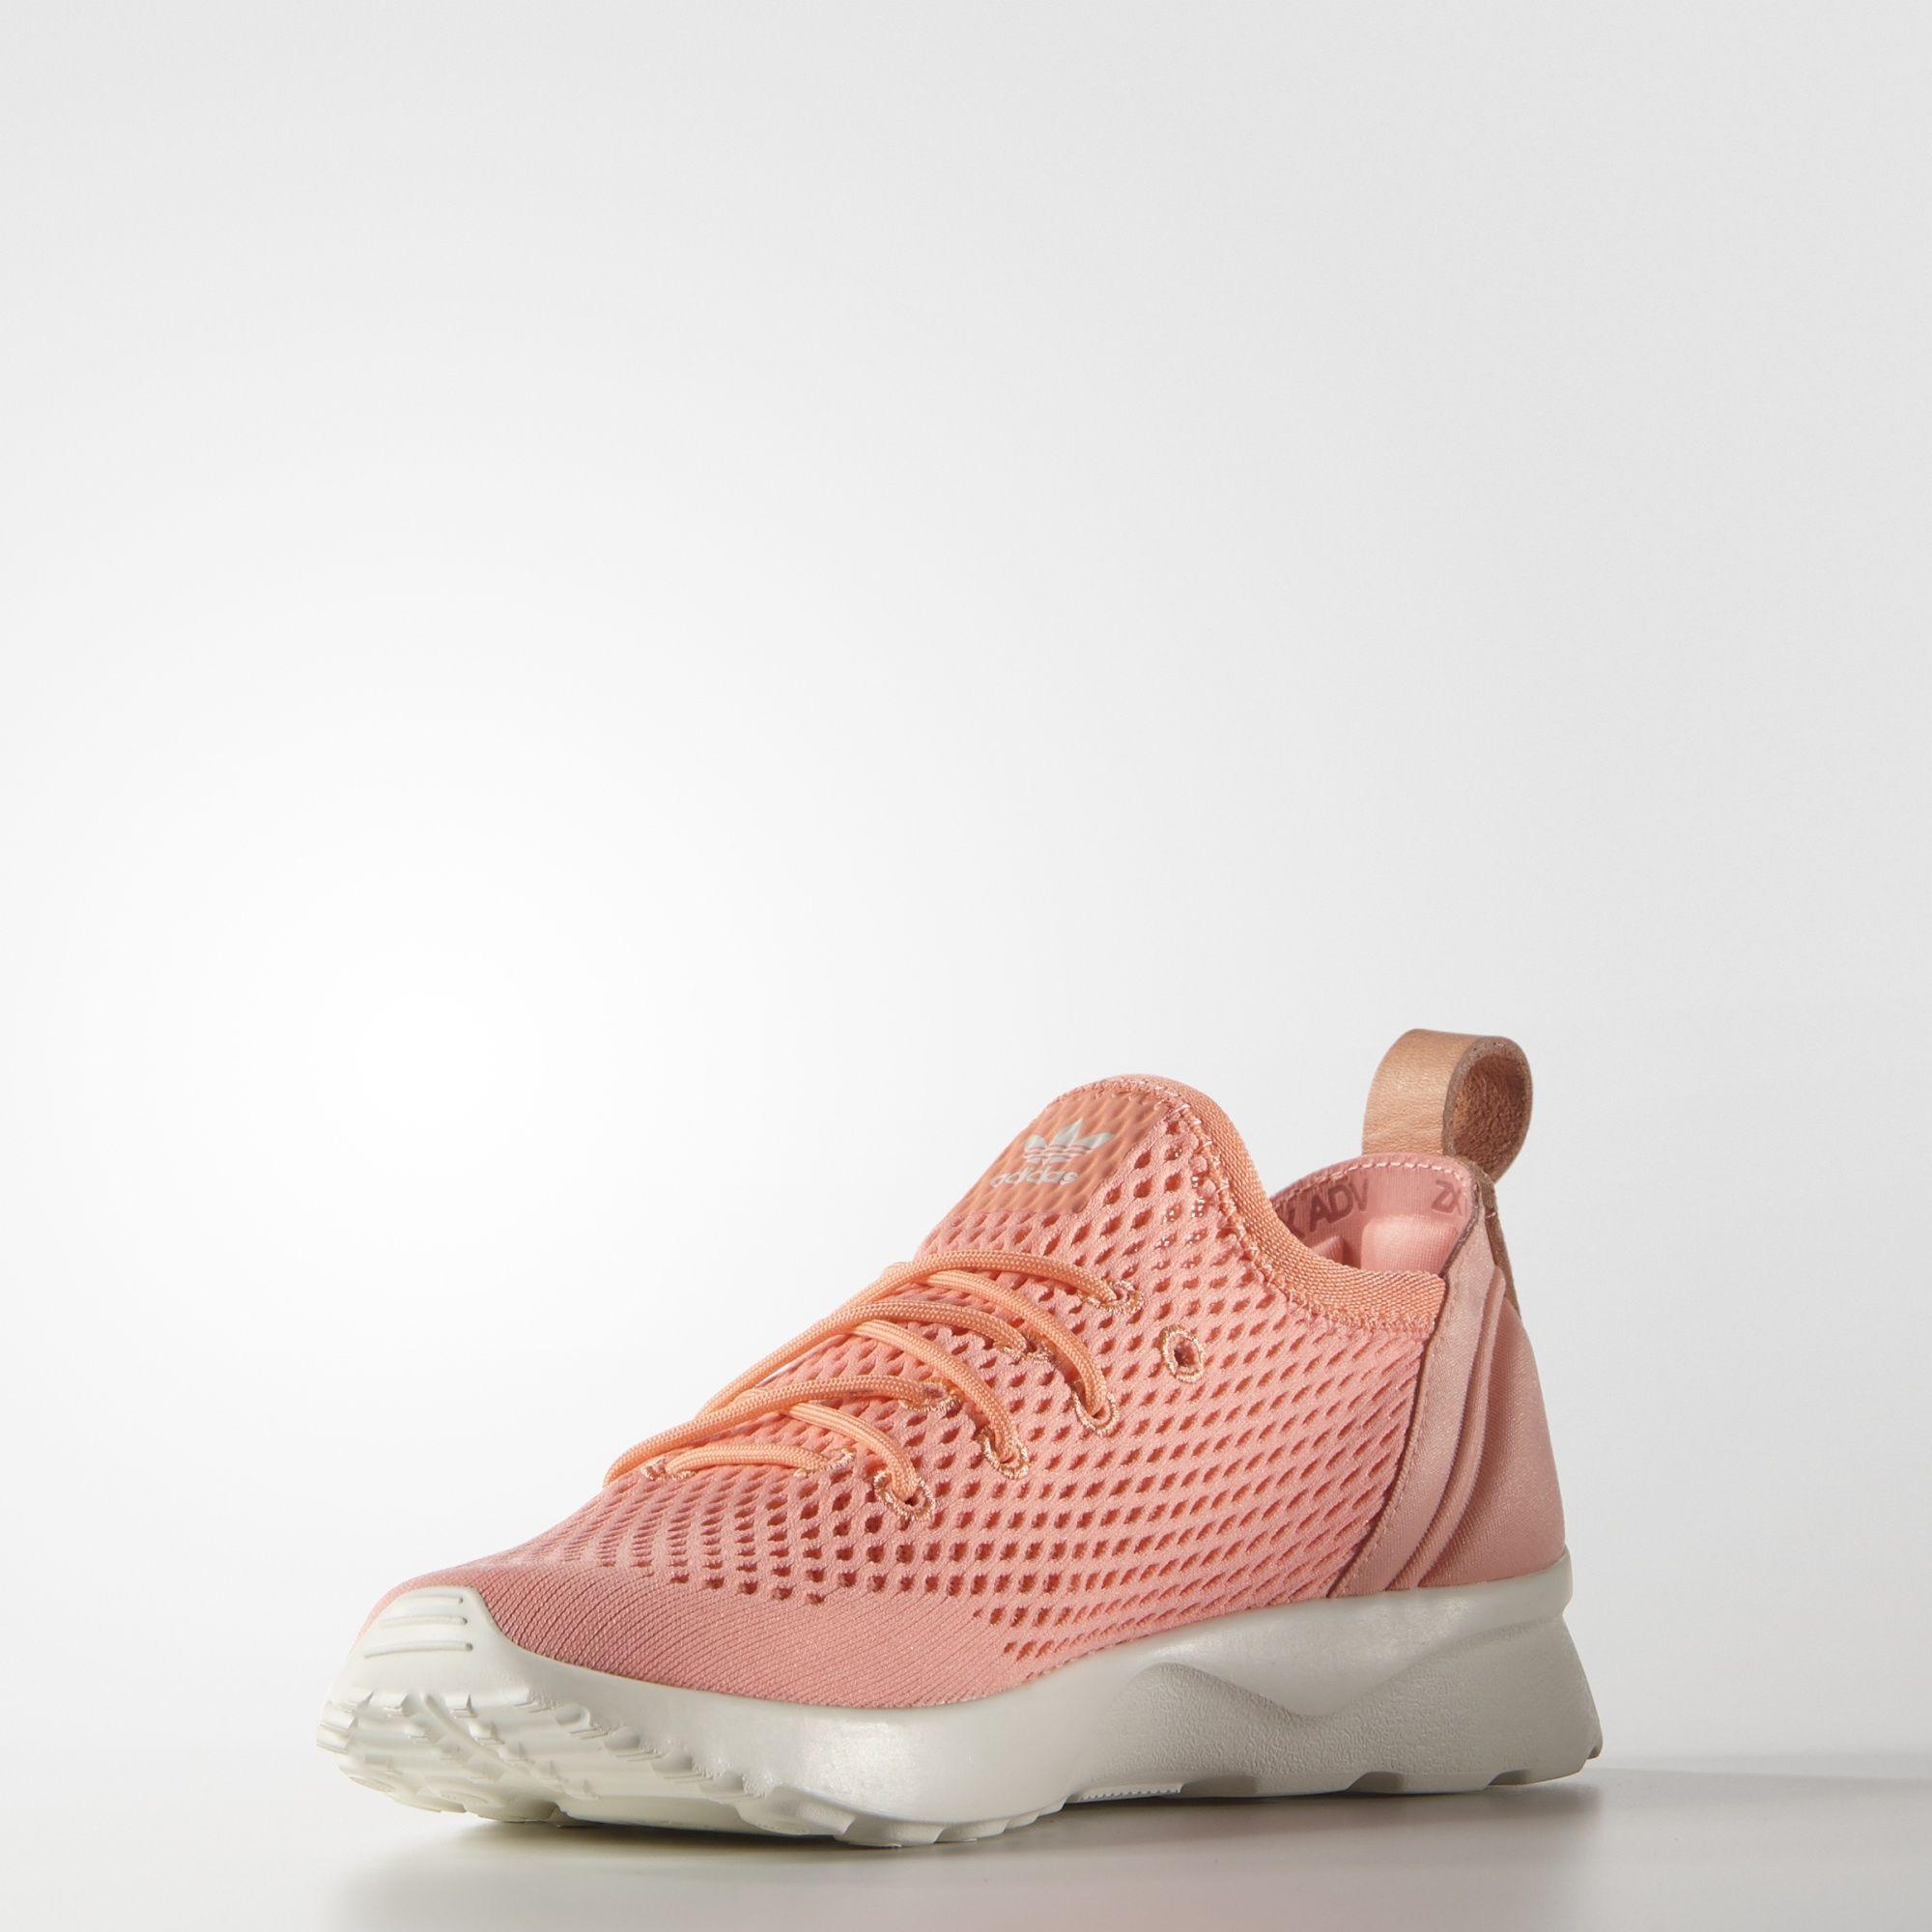 adidas zx flusso avanzata virtù em le scarpe pinterest zx flusso